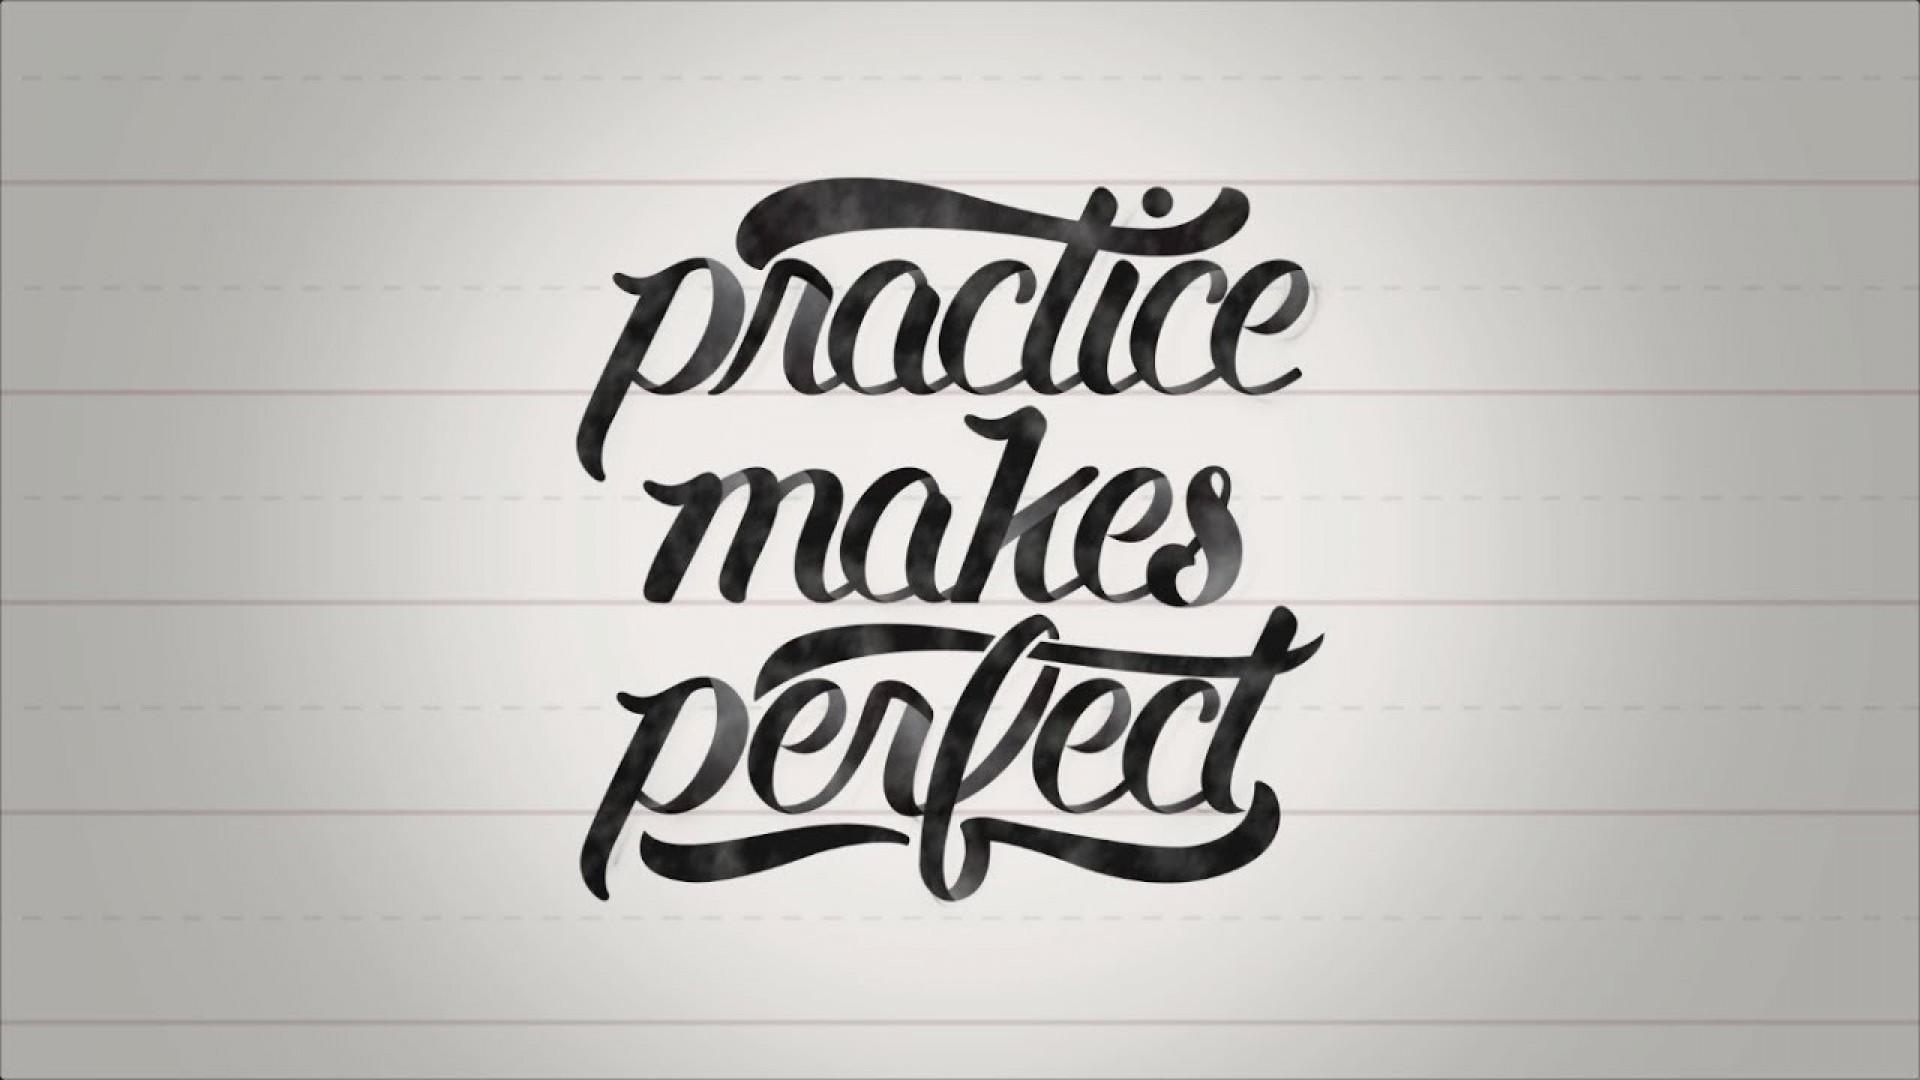 022 Practice Makes Man Perfect Essay Maxresdefault Singular In Hindi 1920